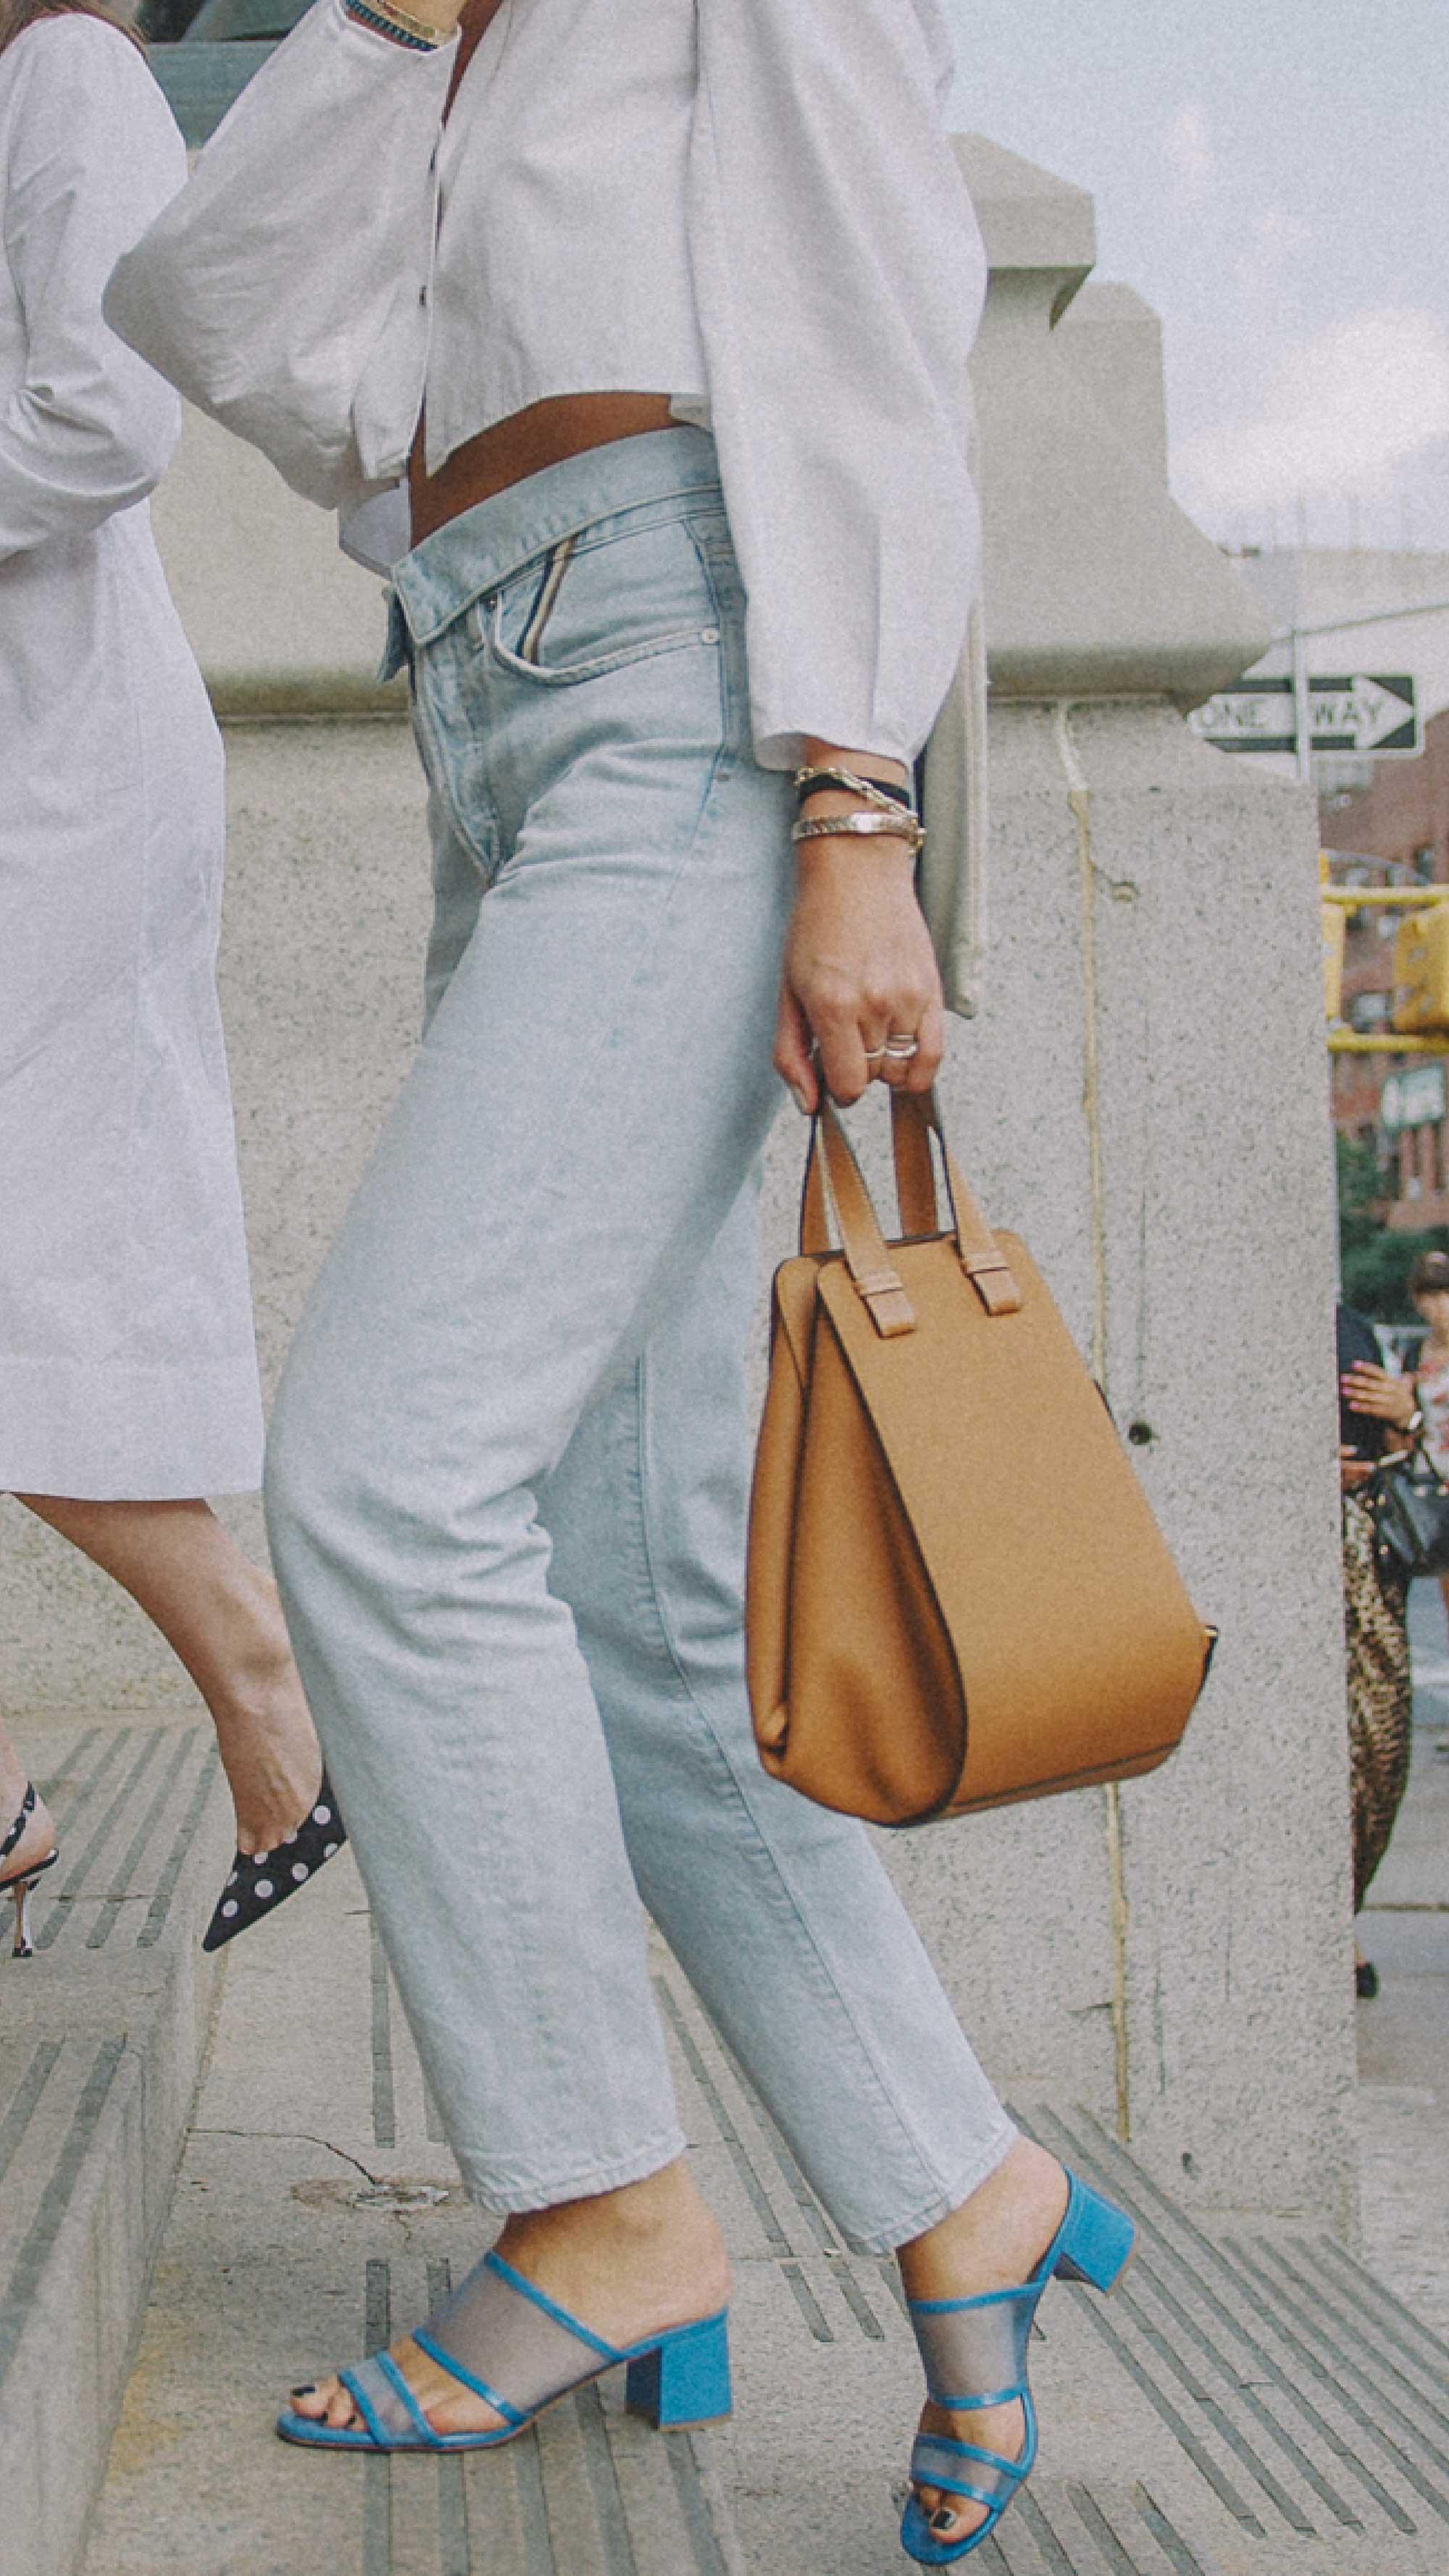 New-York-Fashion-Week-NYFW-SS18-street-style-day-one12.jpg